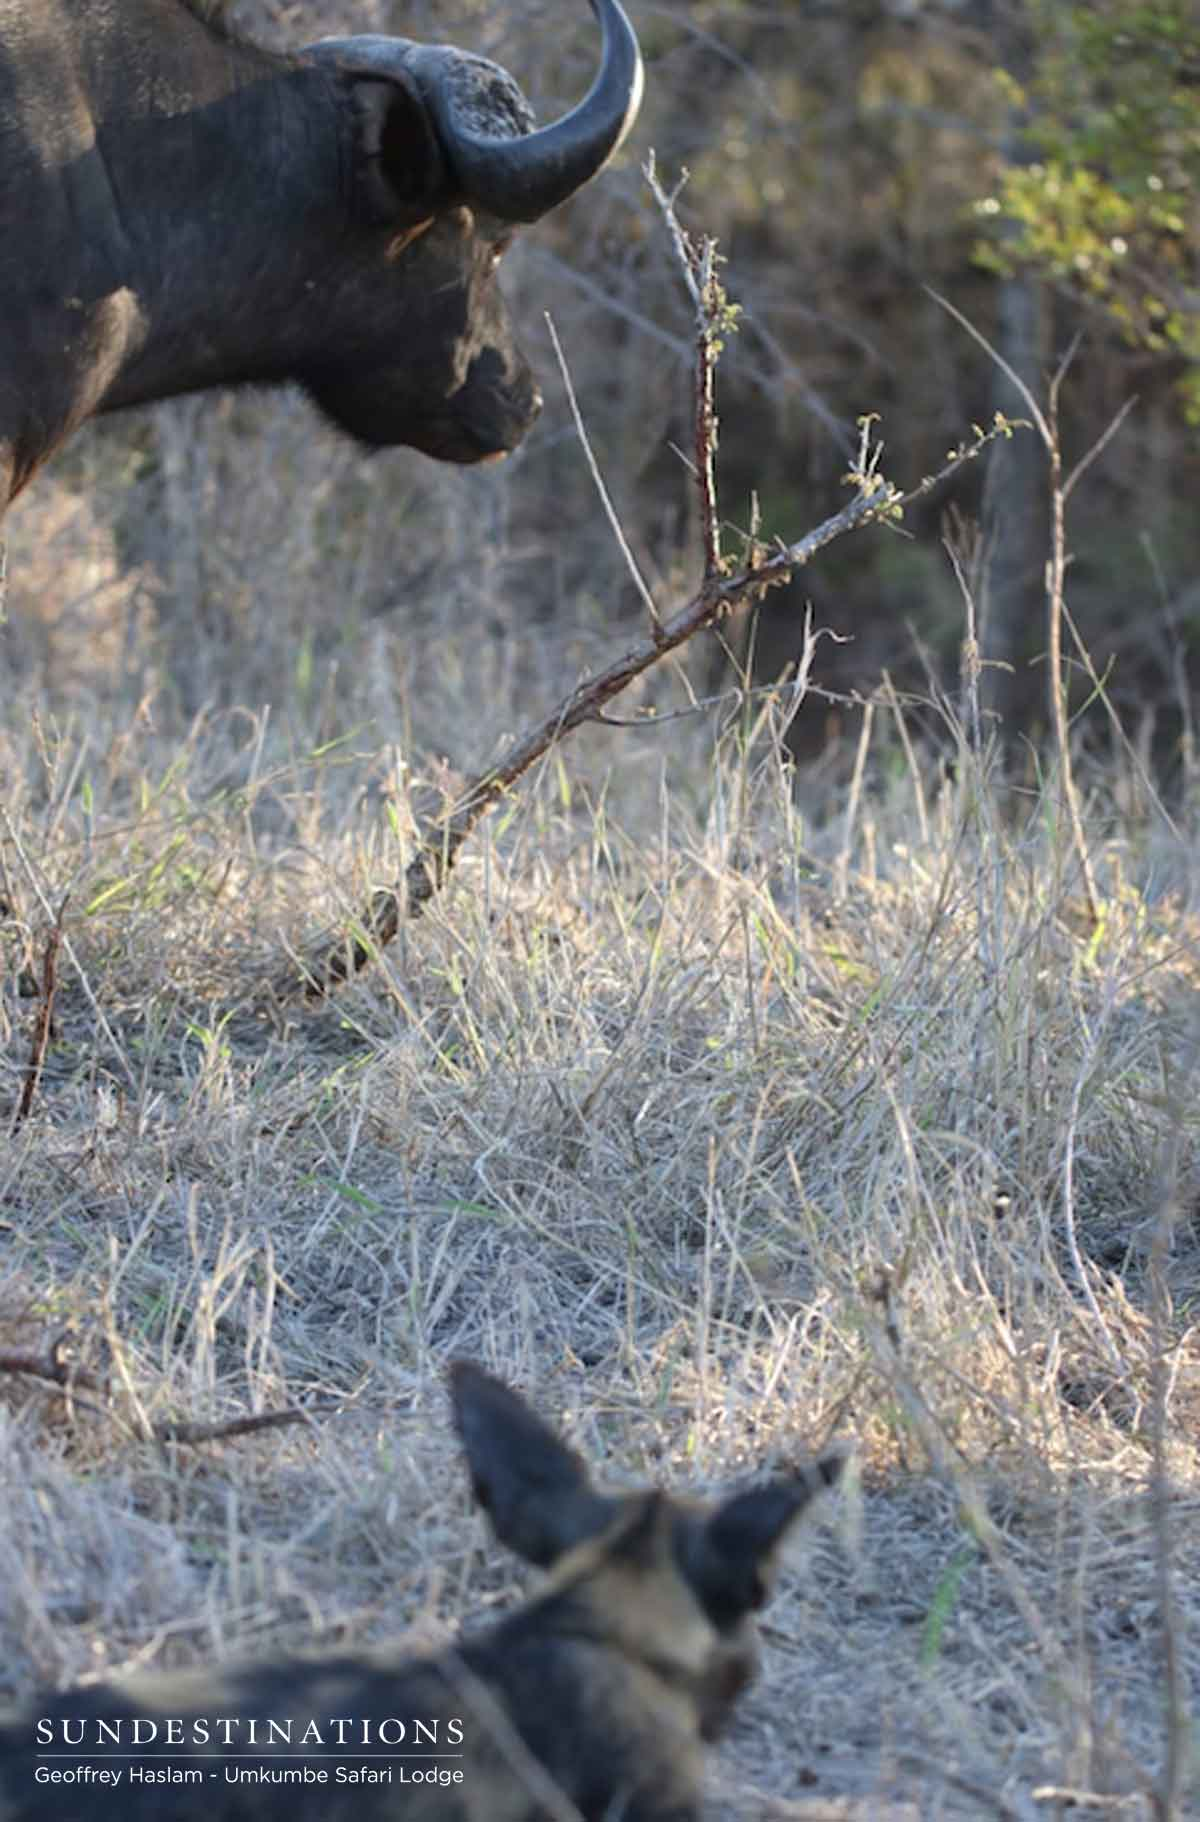 Buffalo and Wild Dog at Umkumbe